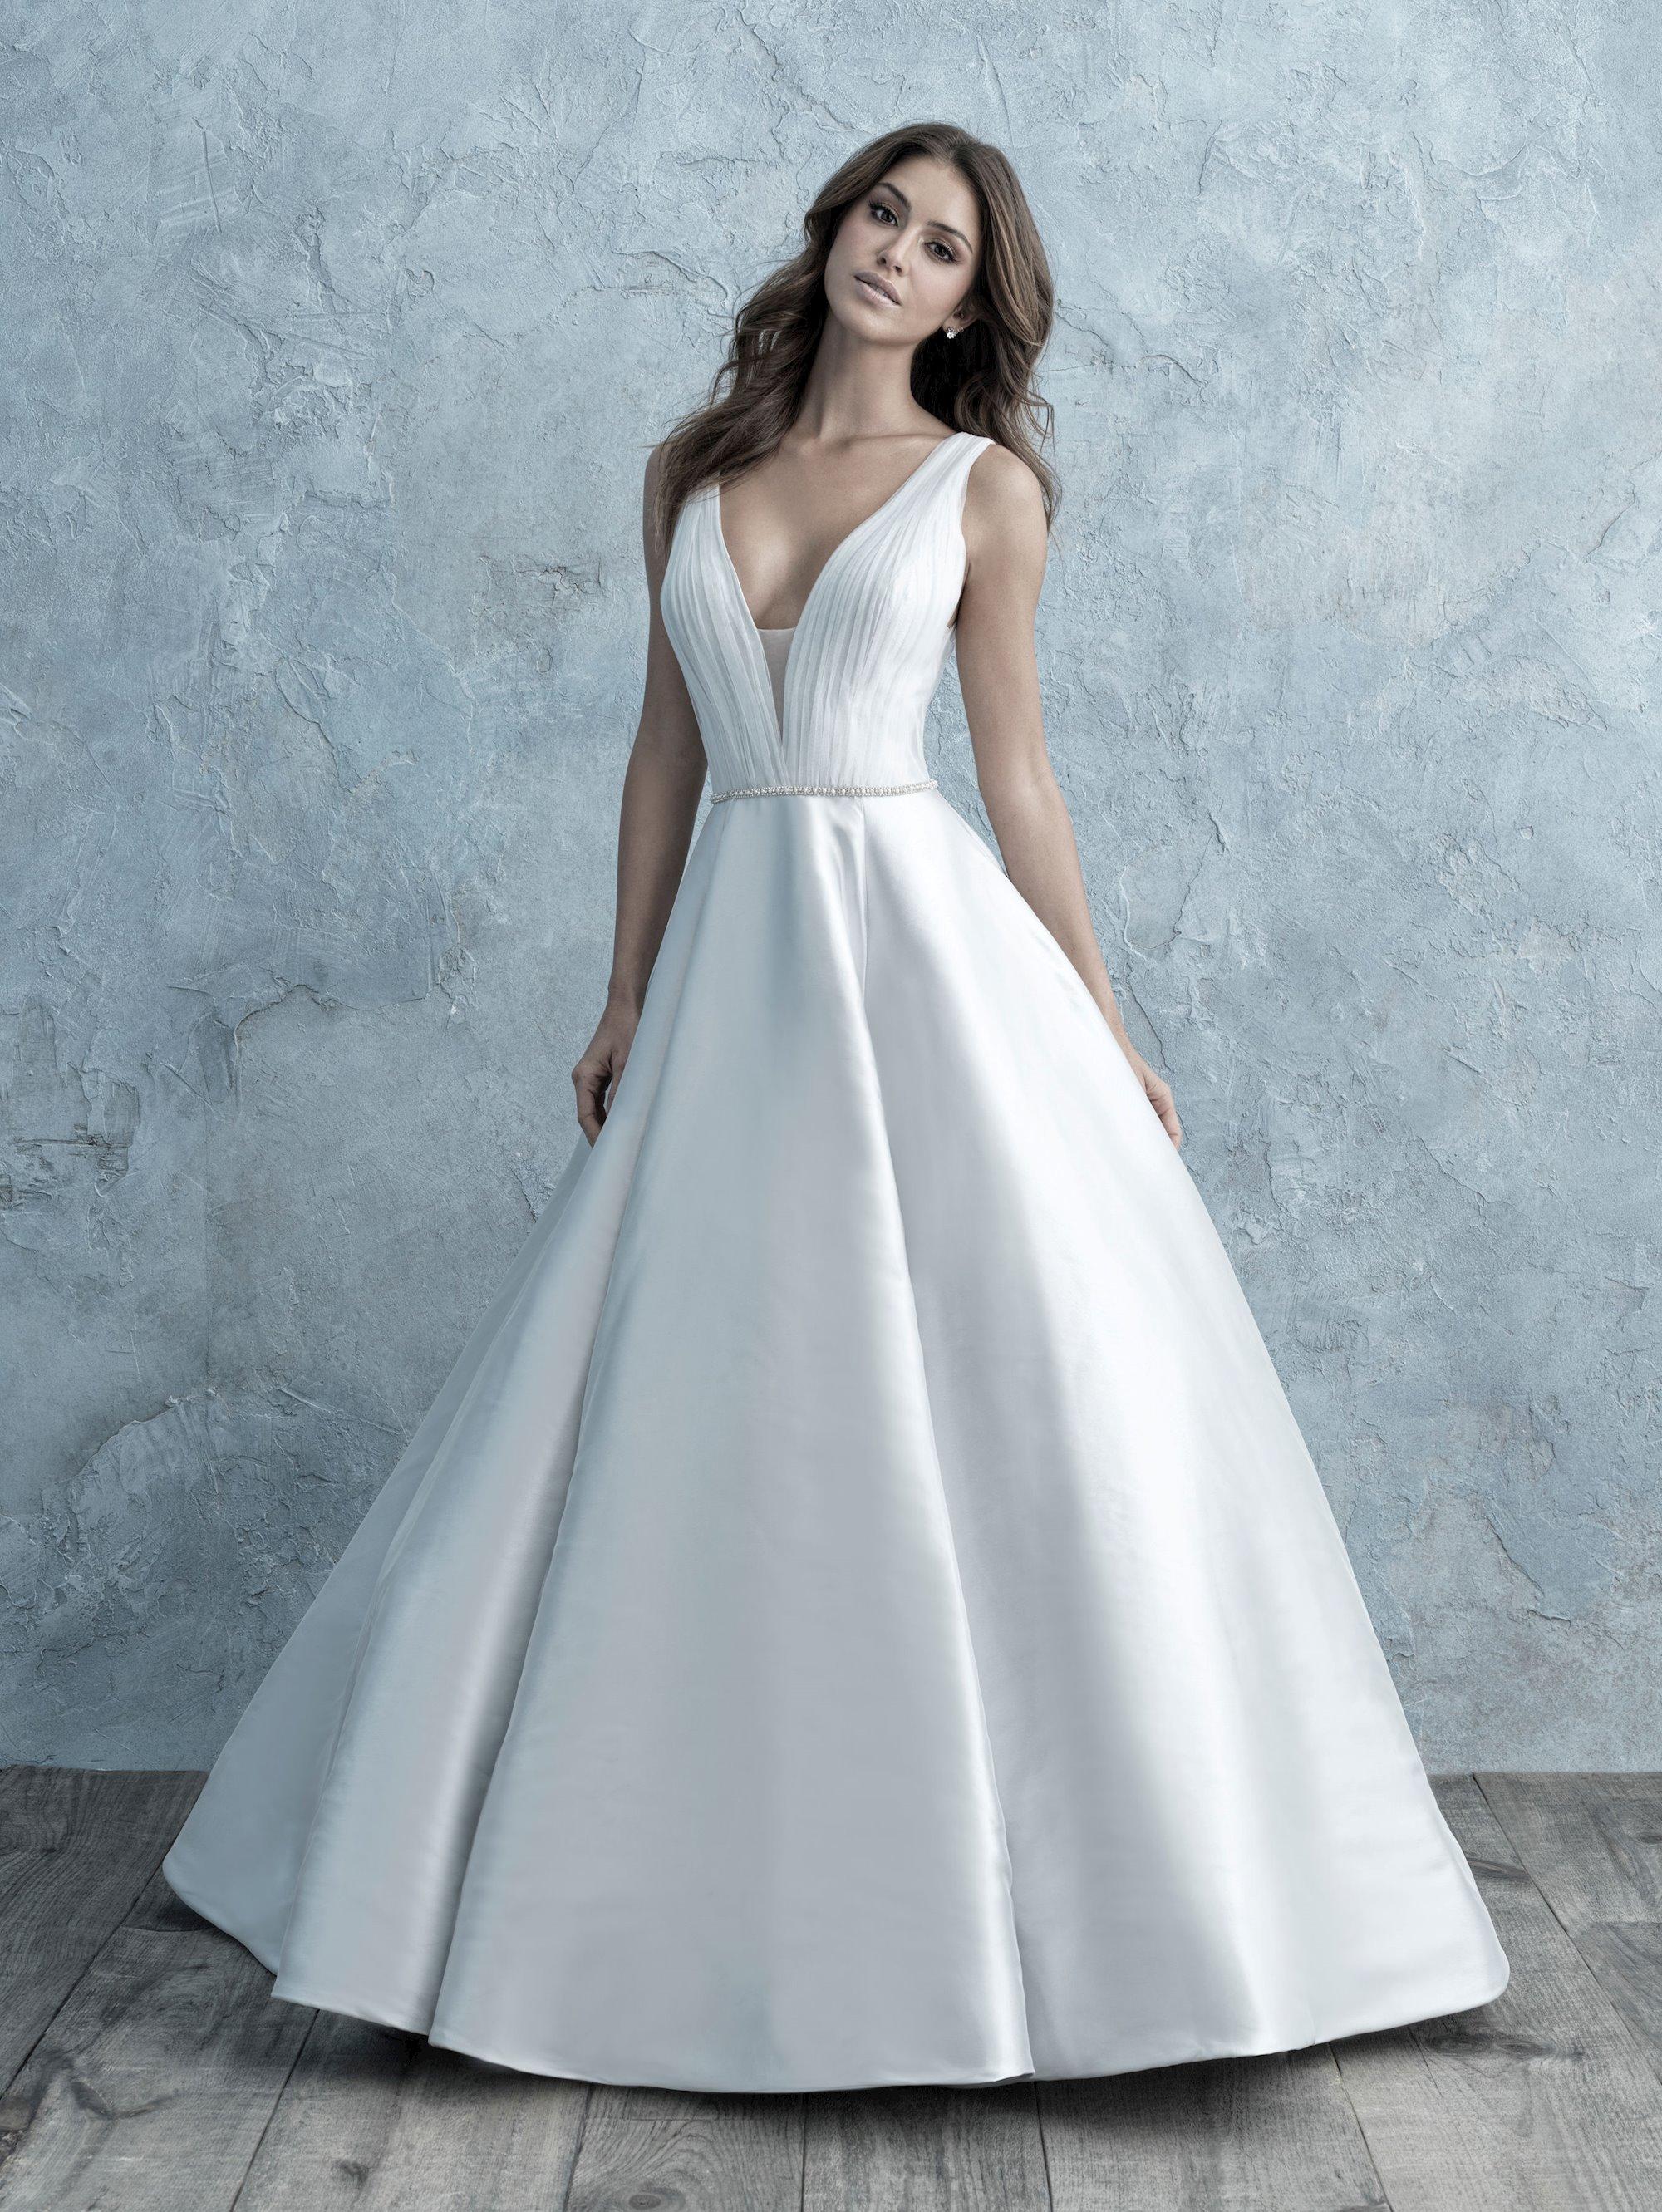 Allure Wedding Dresses.Allure Bridals 9680 Nikki S Glitz And Glam Boutique Bridal Gown